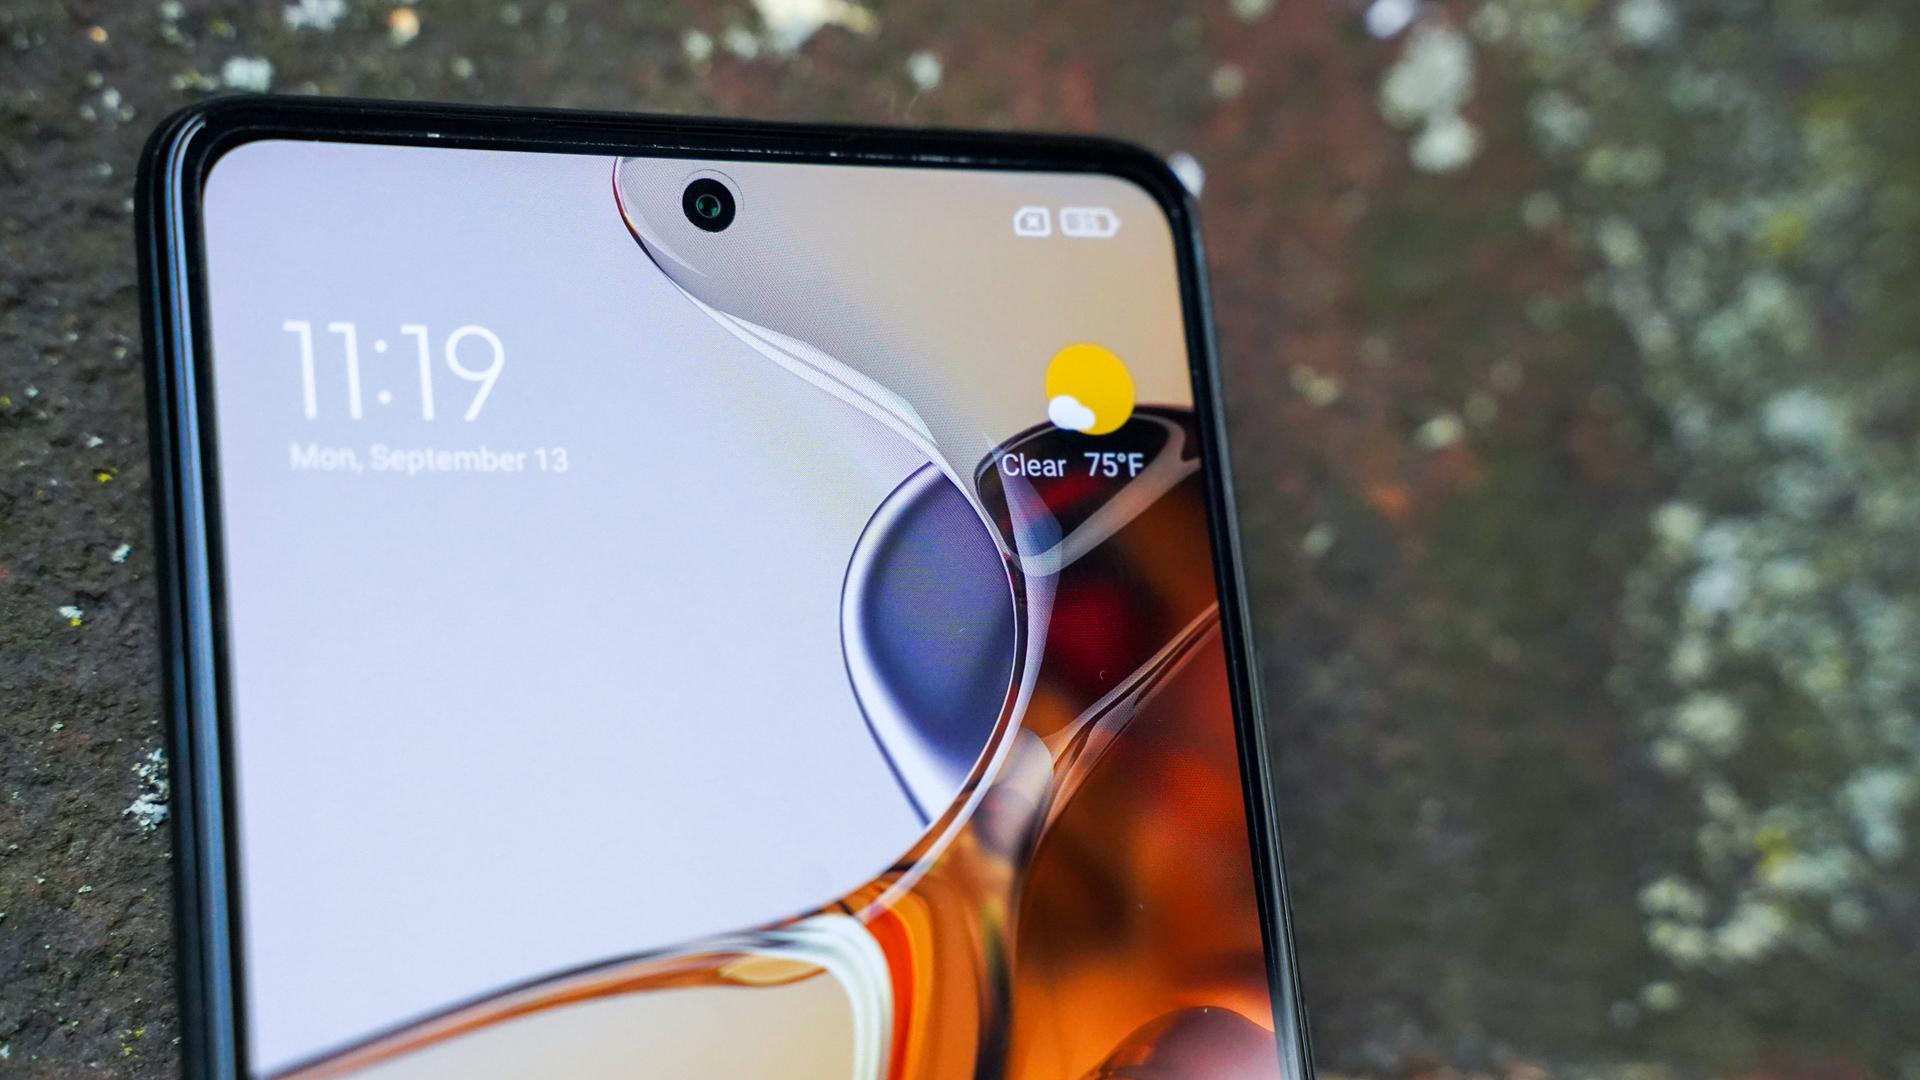 Xiaomi 11T Pro selfie camera closeup